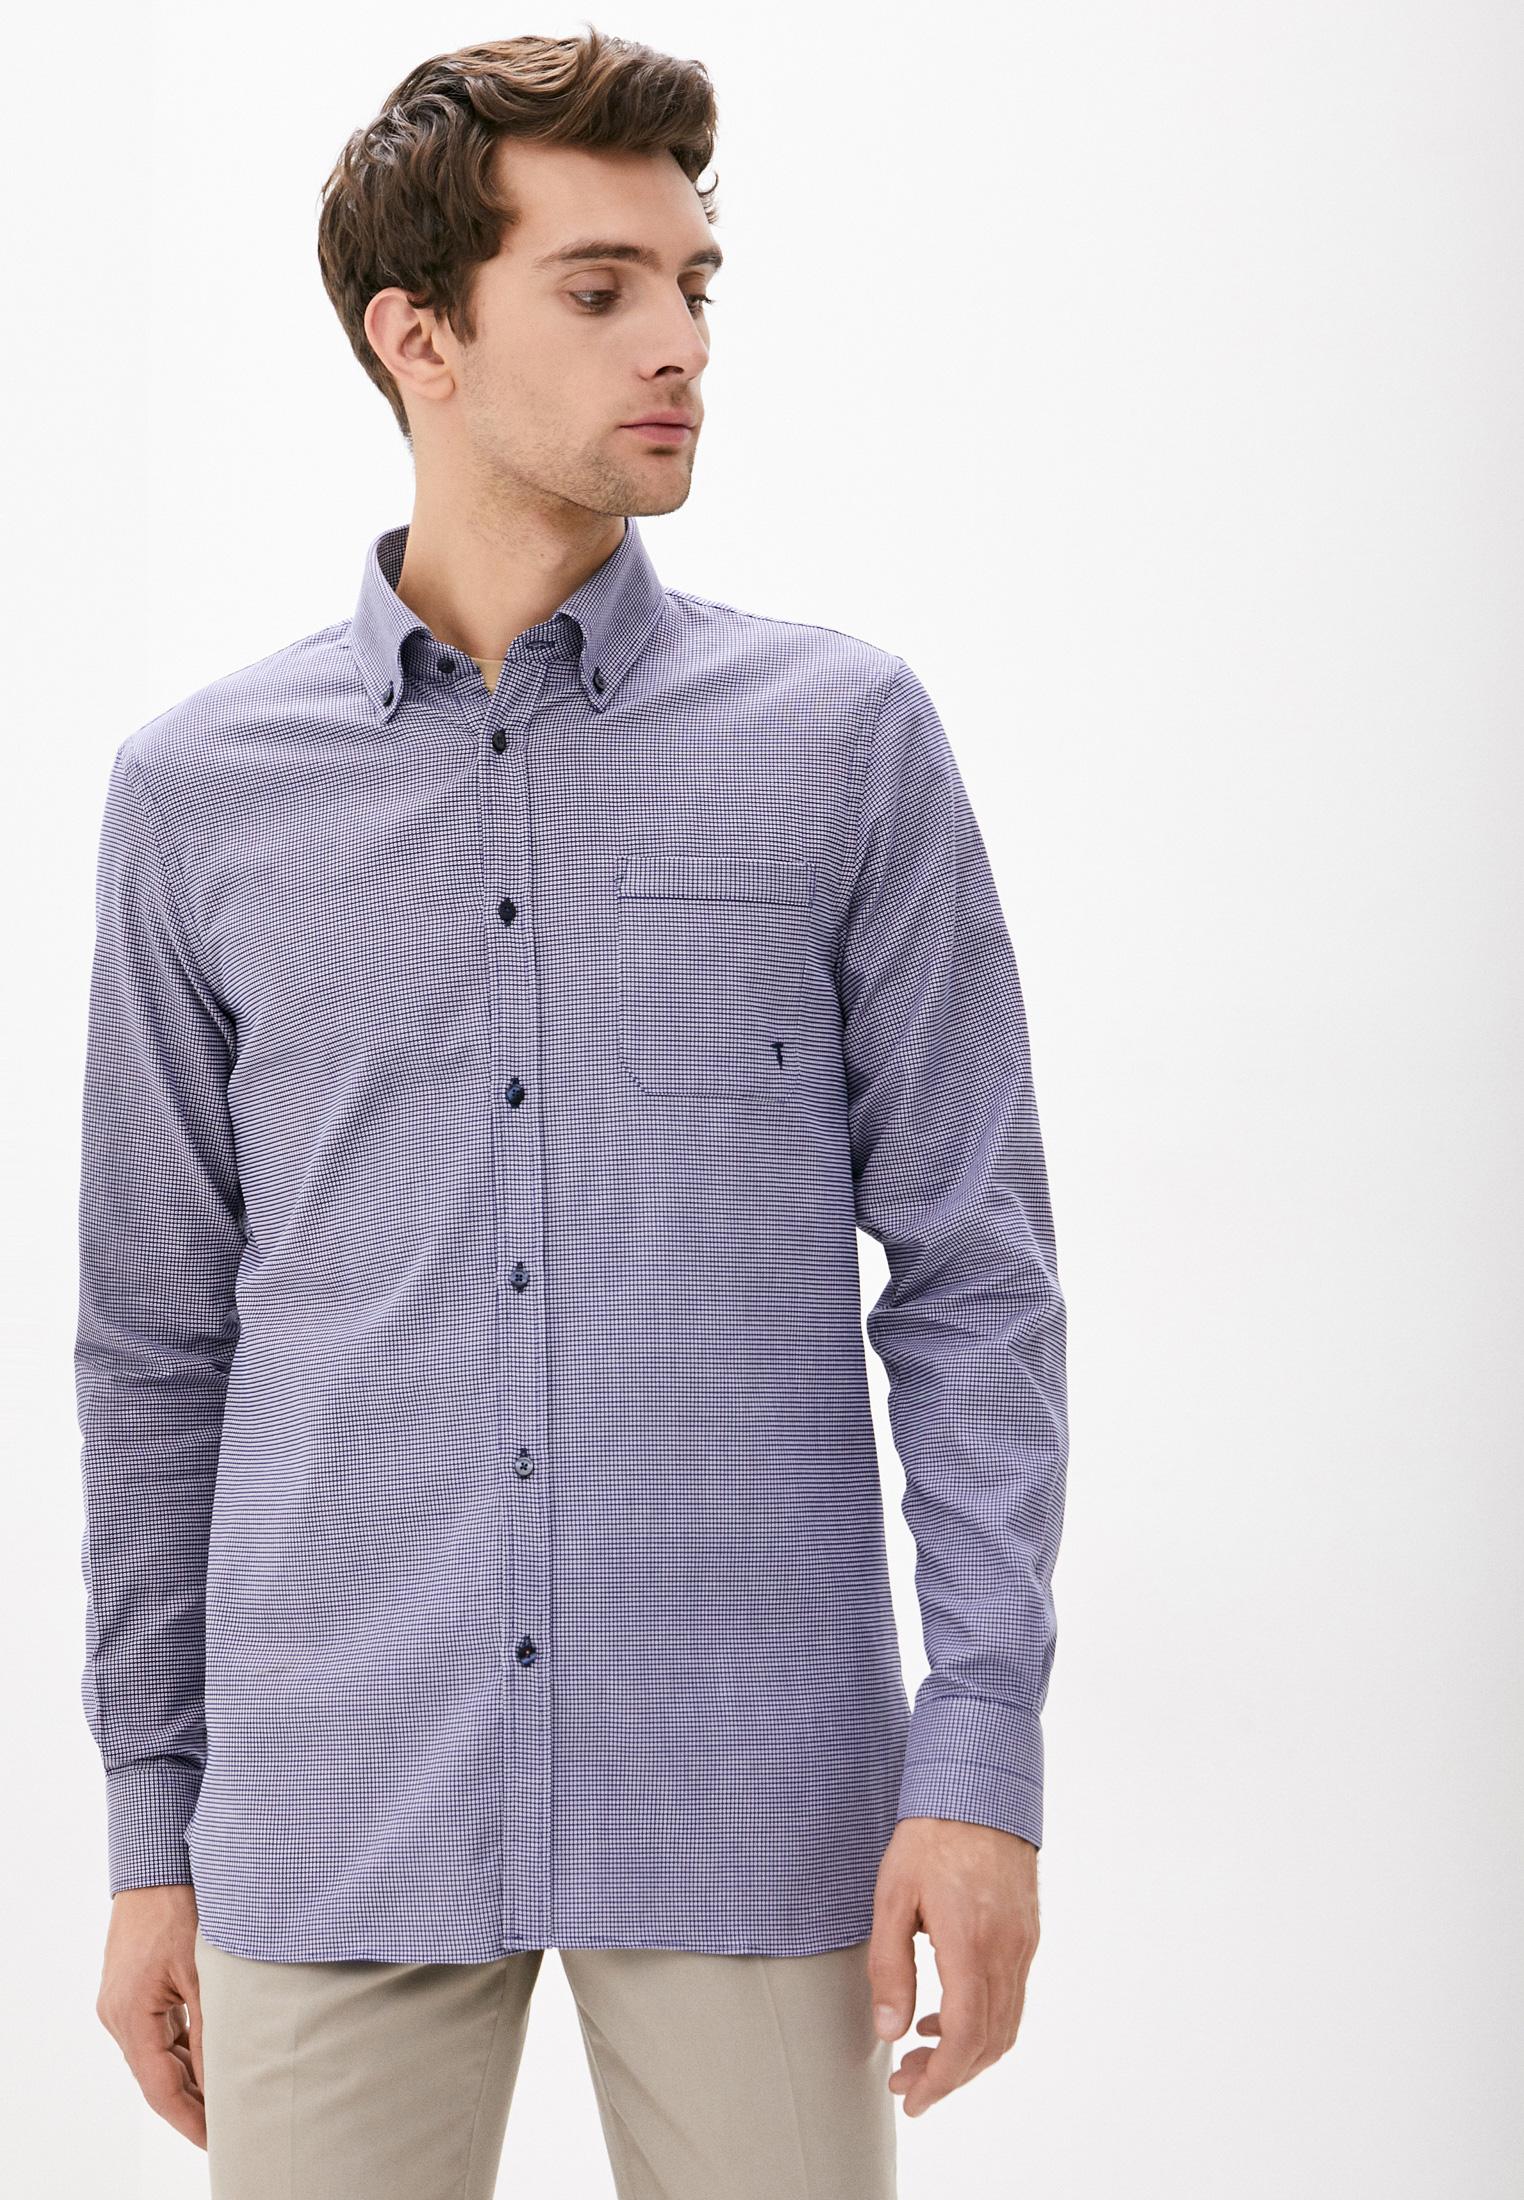 Рубашка с длинным рукавом Trussardi (Труссарди) 52C00172-1T004327